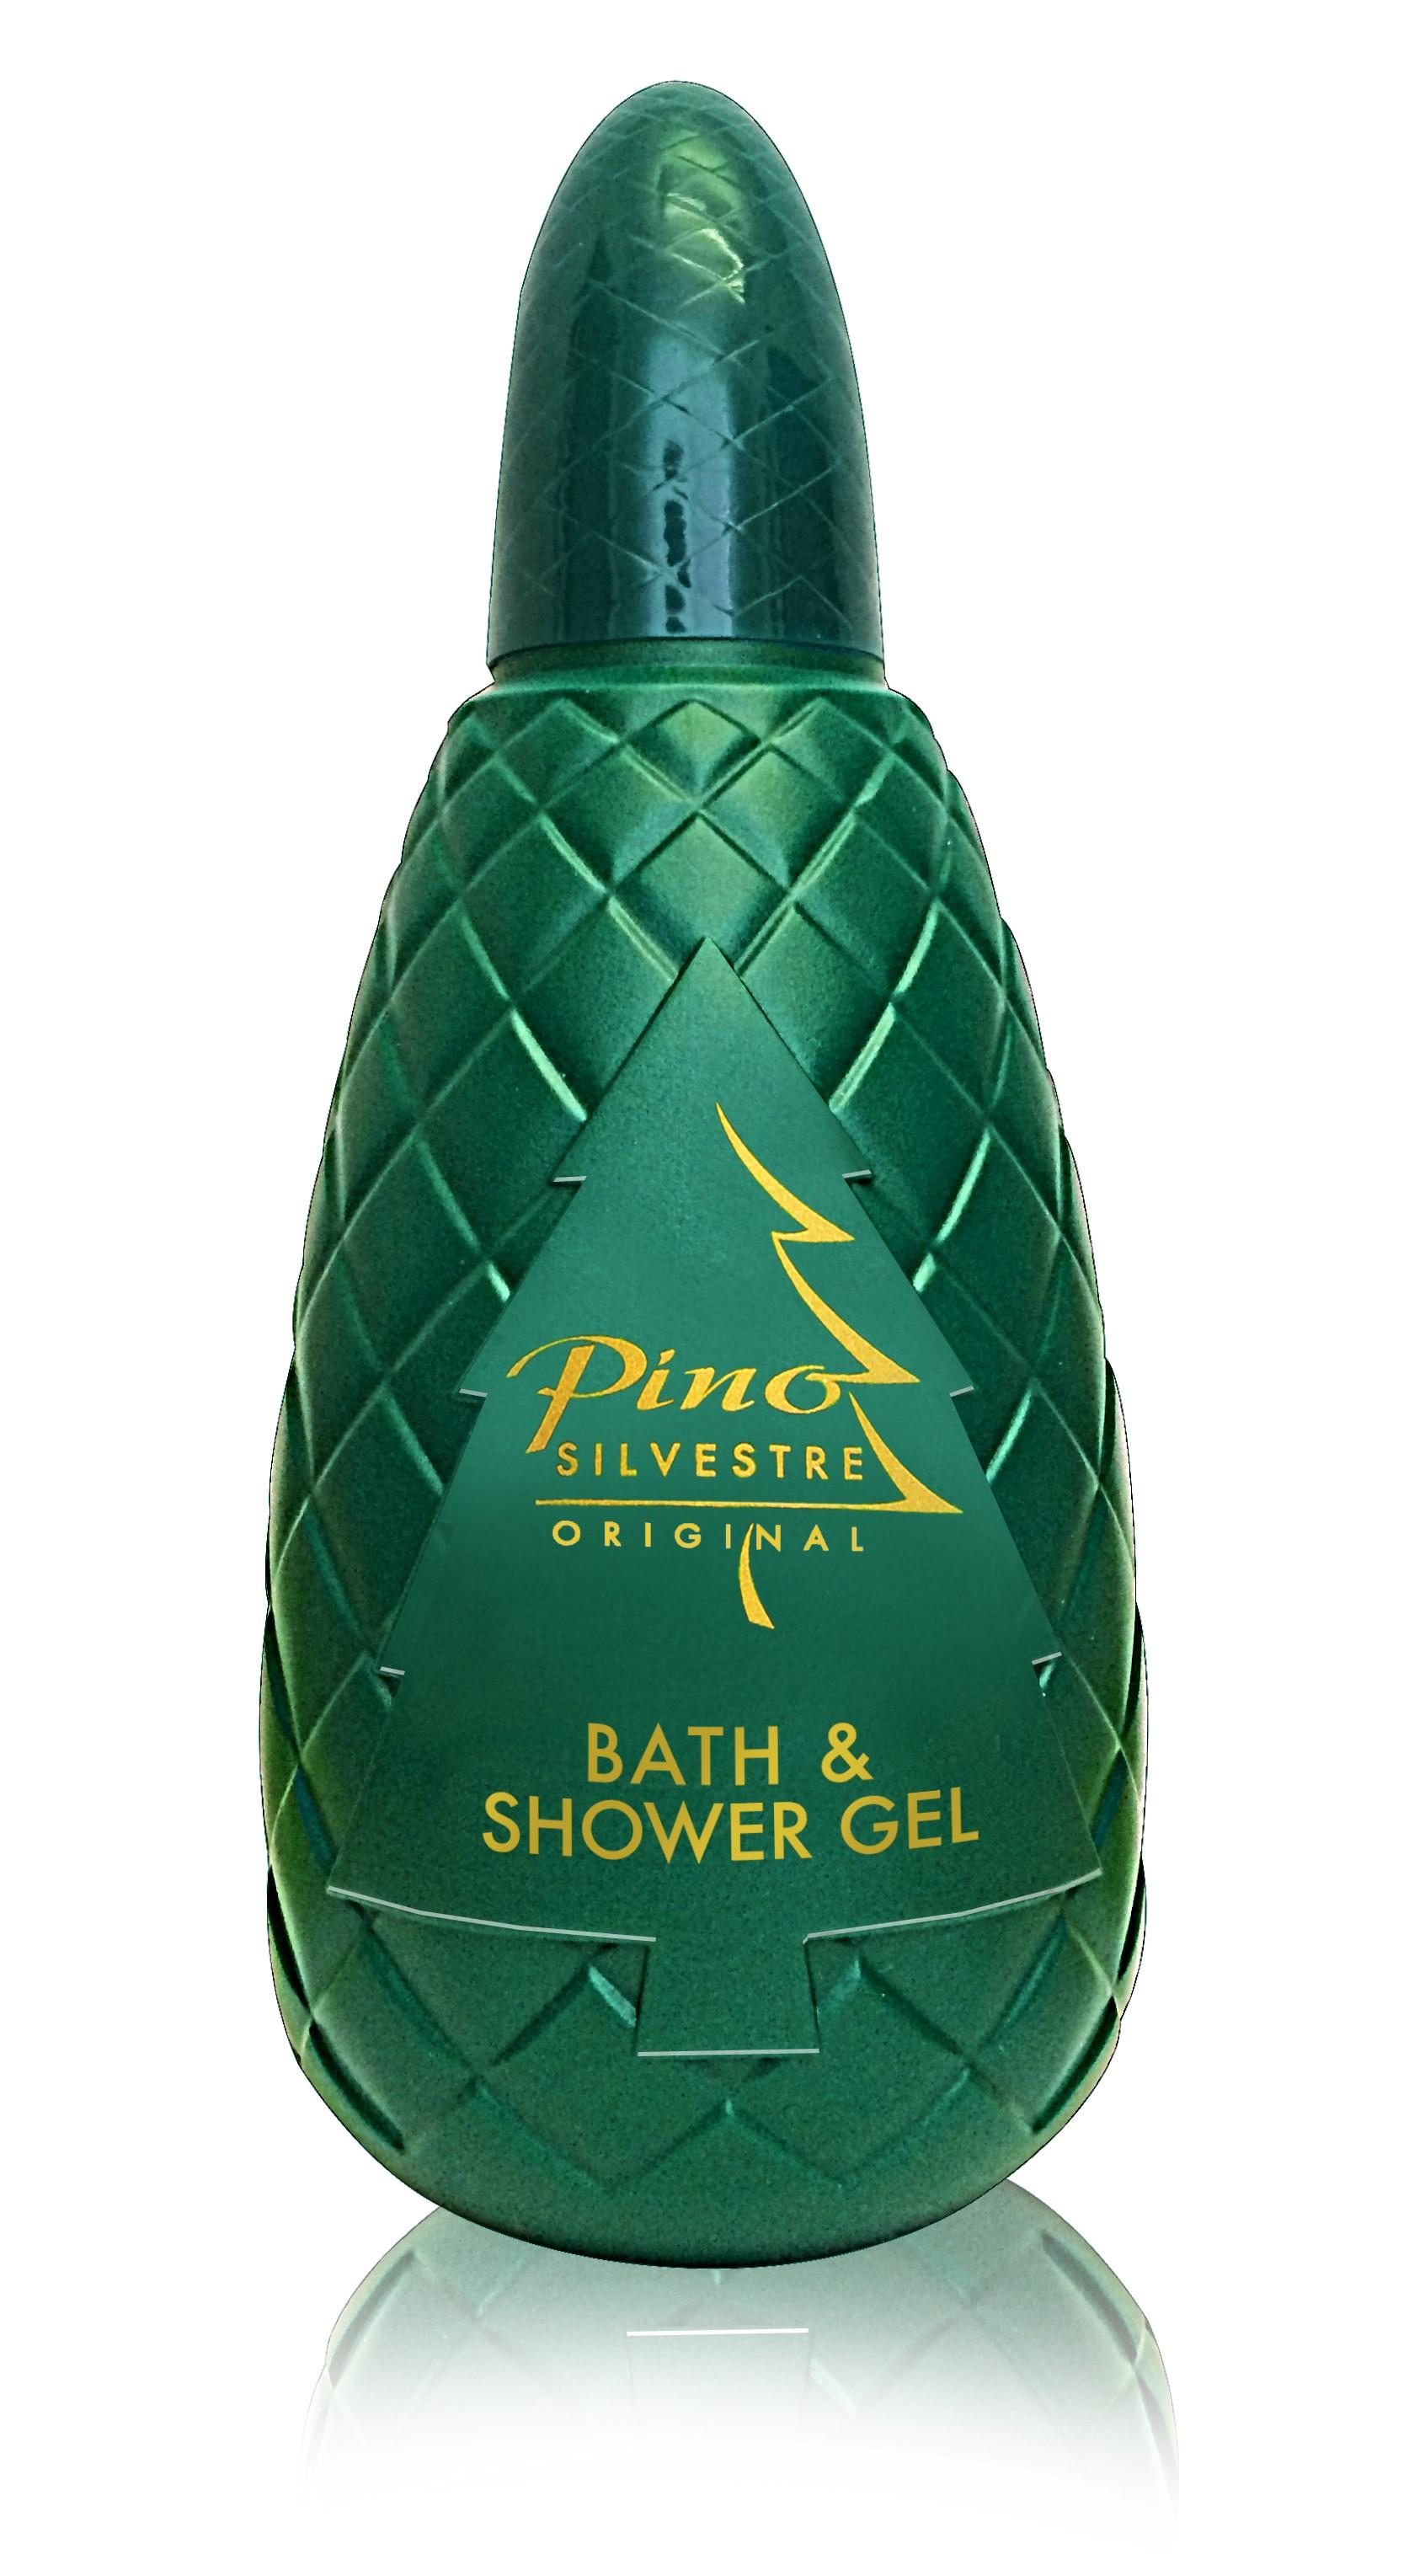 Pino Silvestre Bath & Shower Gel 1000ml